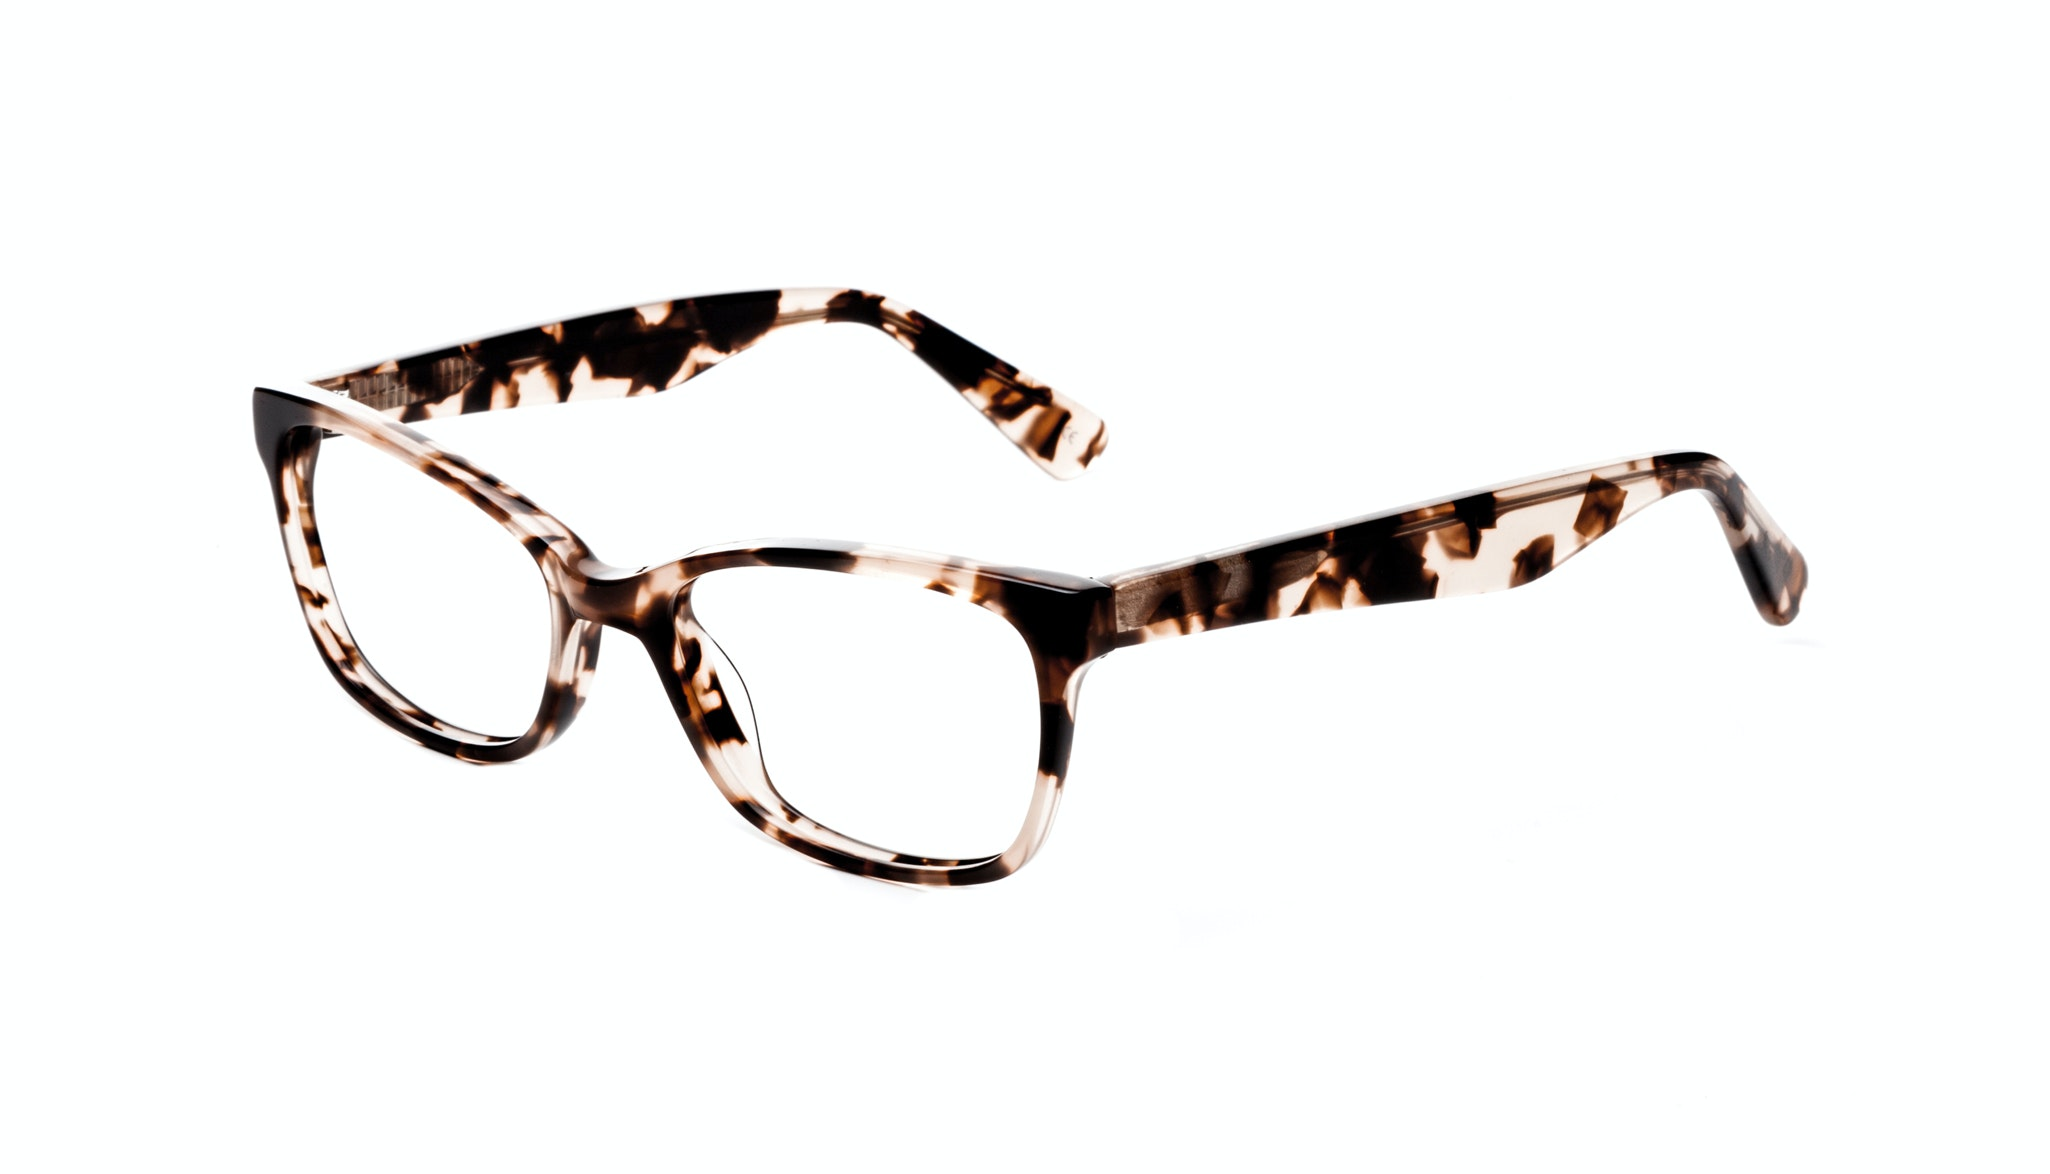 Affordable Fashion Glasses Cat Eye Rectangle Eyeglasses Women Comet Pink Tortoise Tilt